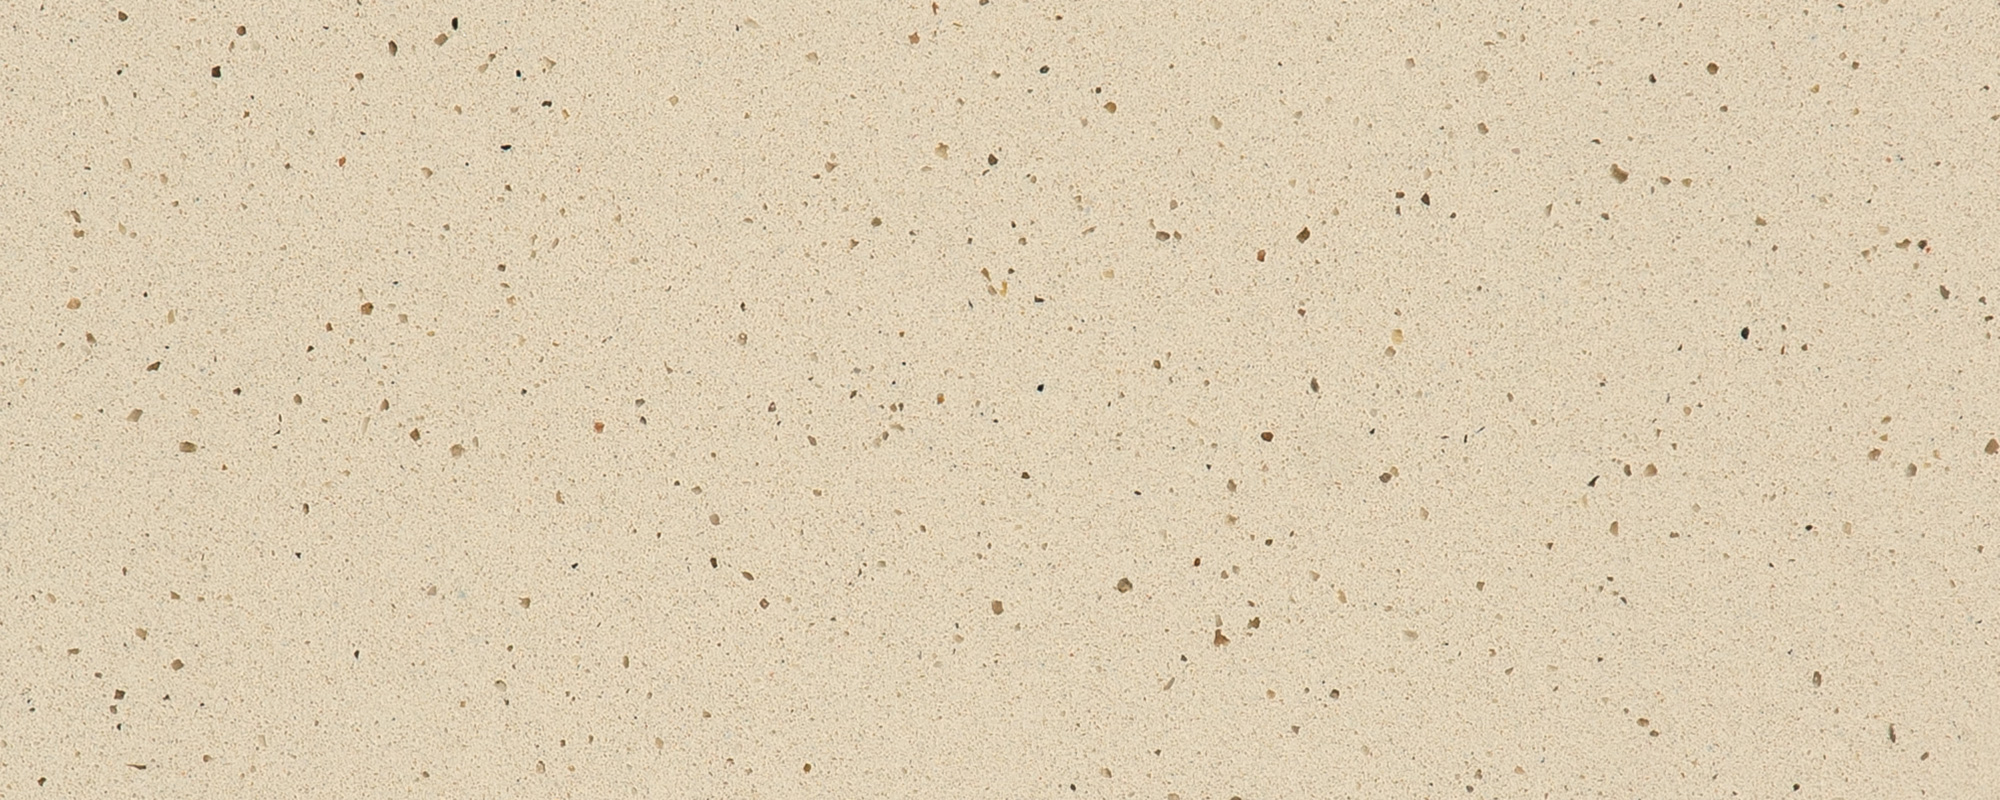 Cuarzo de color moka colecci n petra compac for Marmol color arena